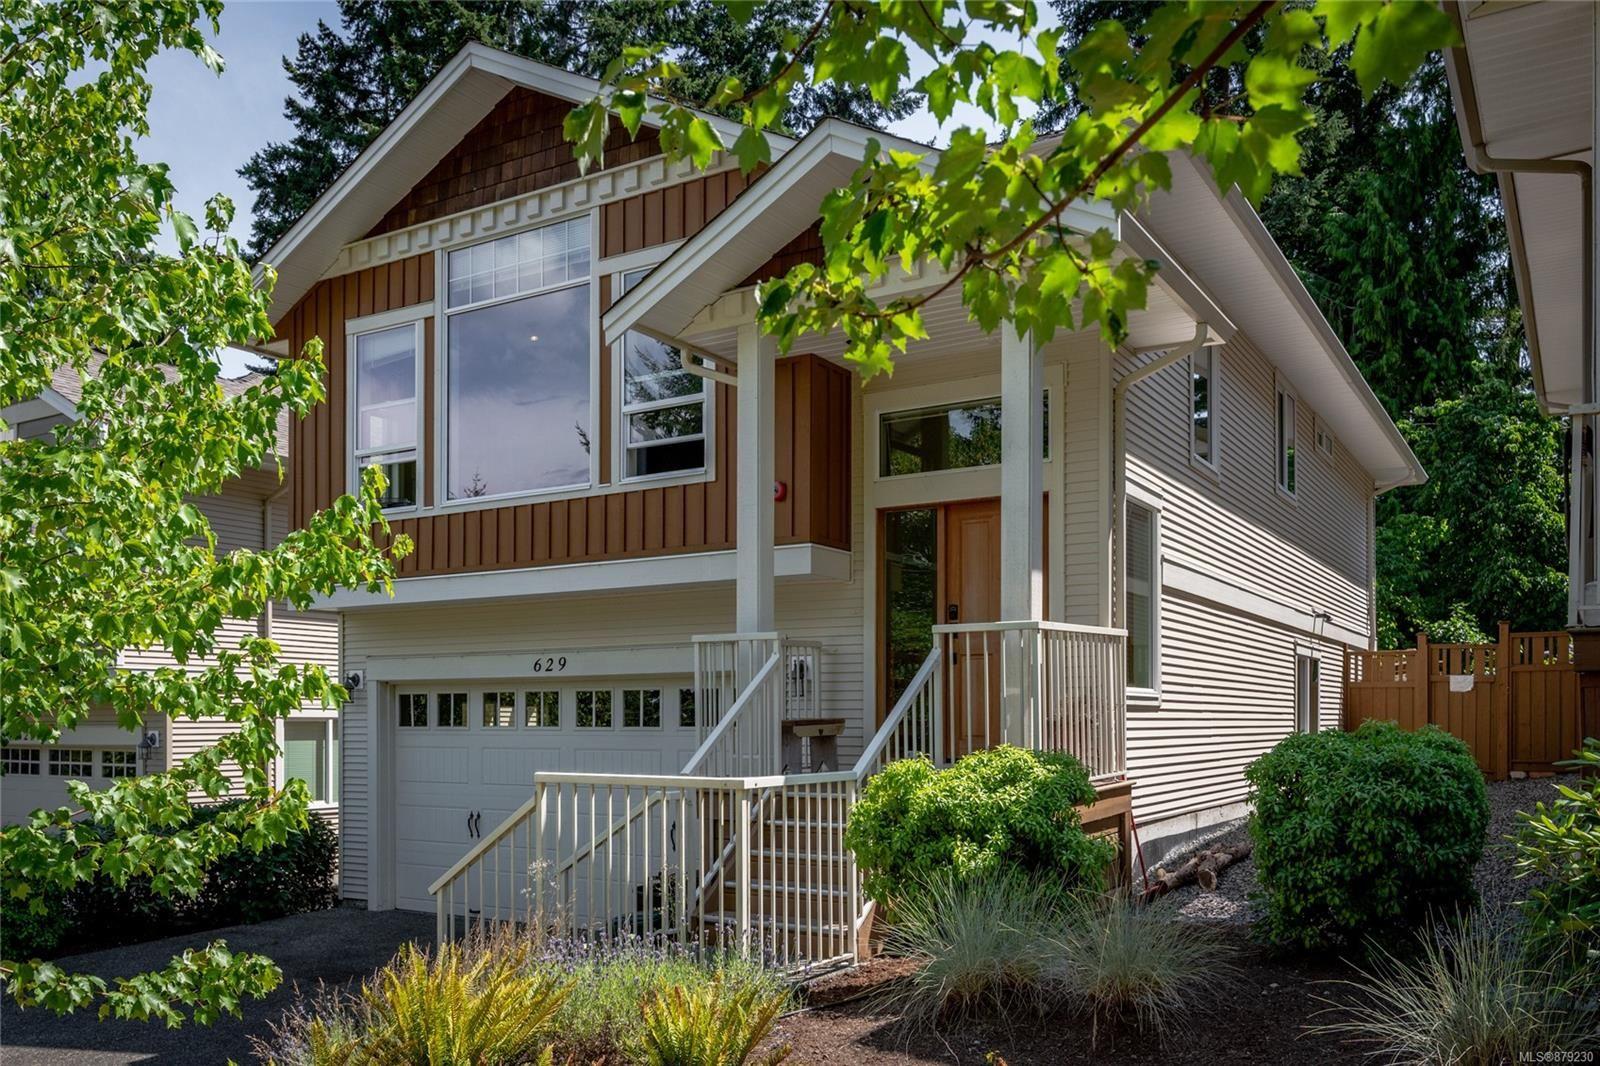 Main Photo: 629 7th St in : Na South Nanaimo House for sale (Nanaimo)  : MLS®# 879230